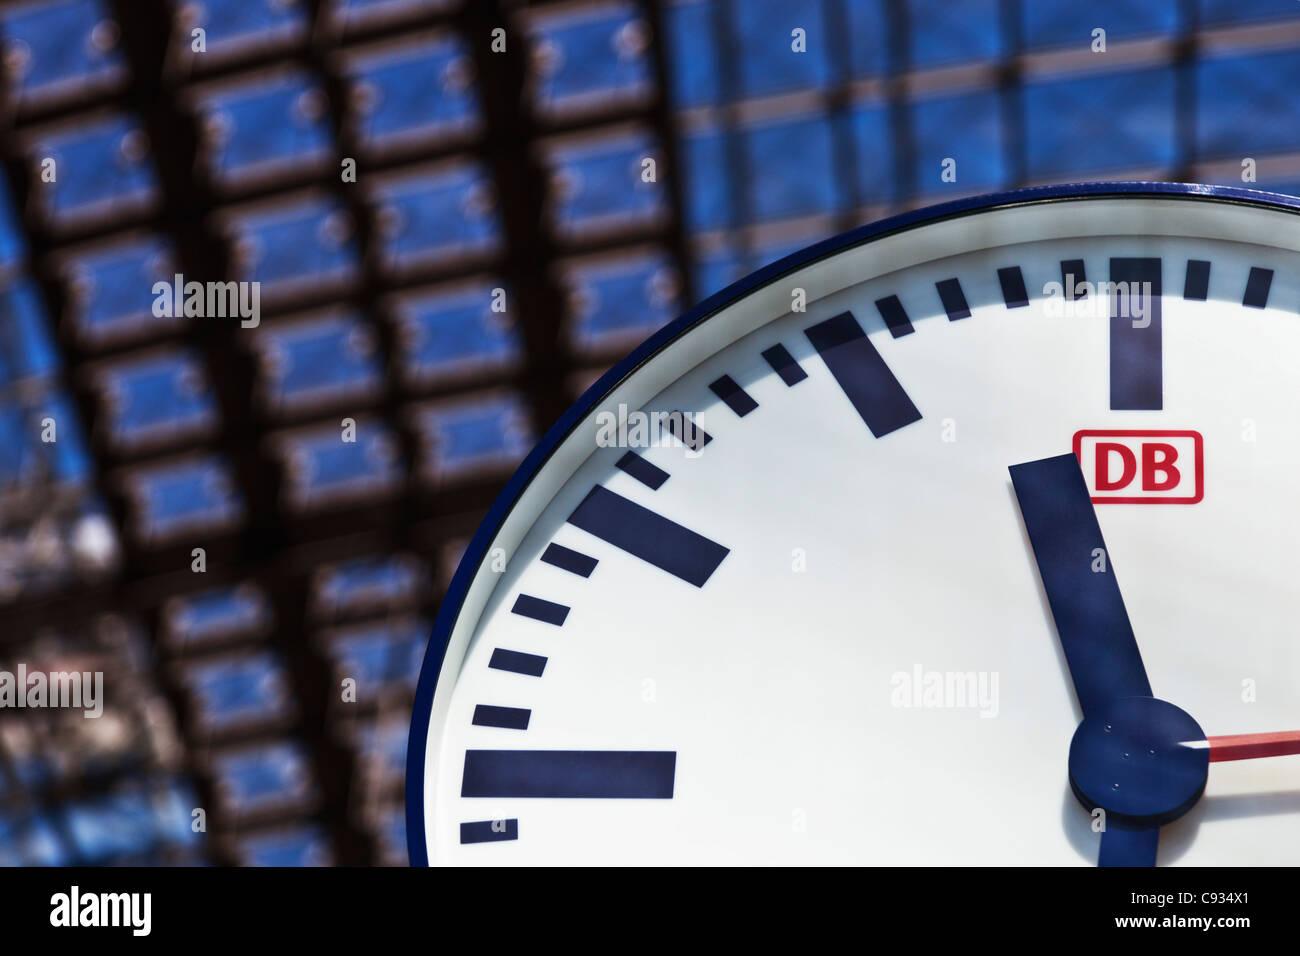 Deutsche Bahn railway station clock in the Berlin Main railway station, hauptbahnhofTiergarten, Berlin, Germany. - Stock Image